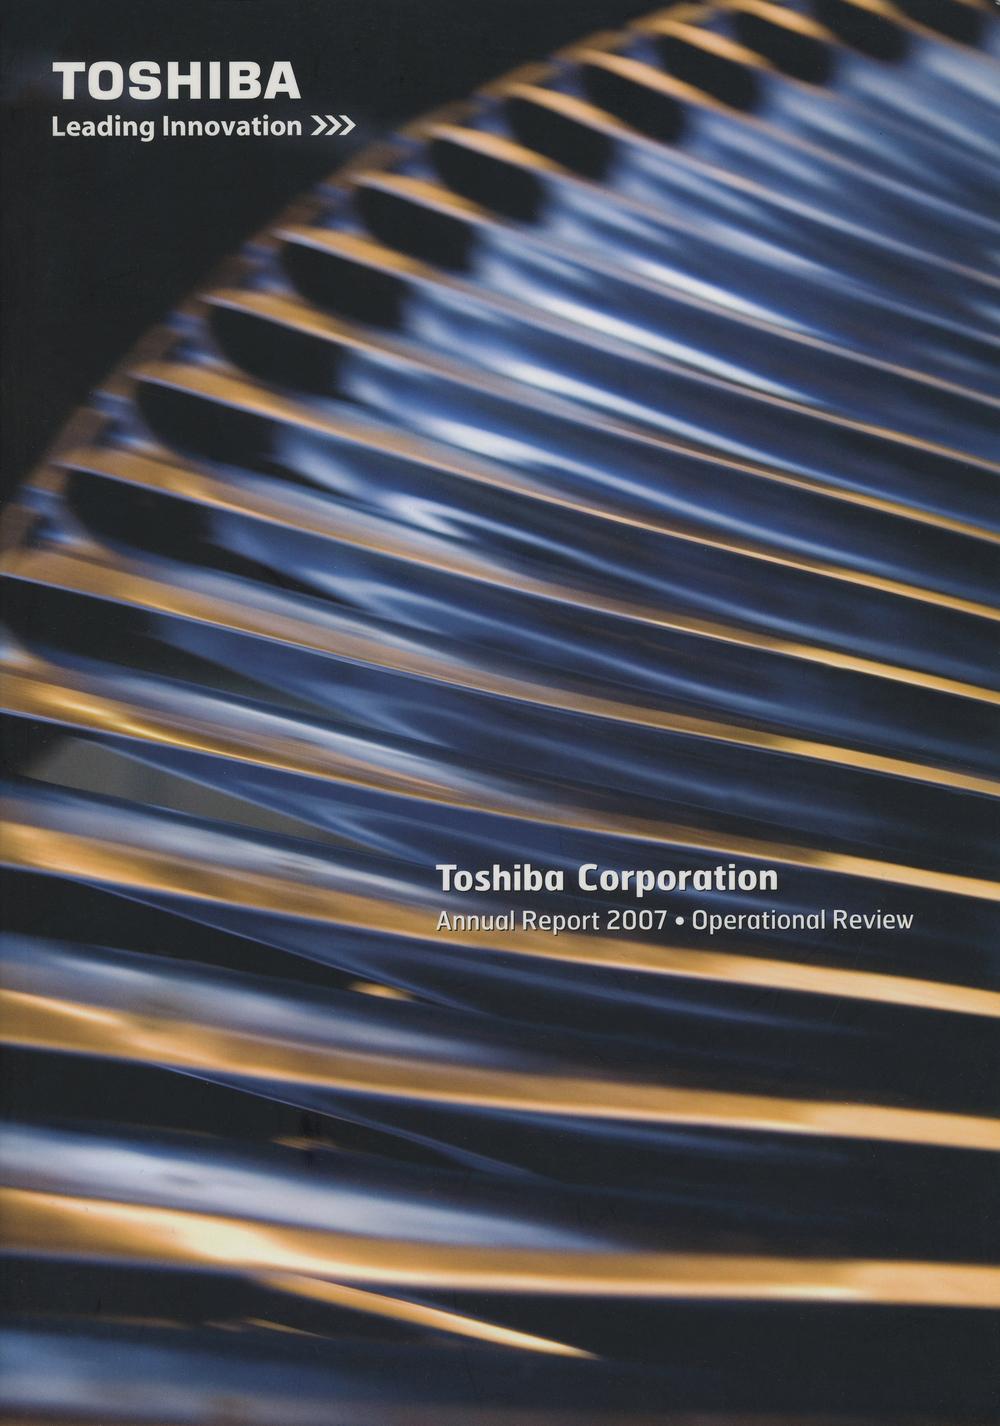 株式会社東芝Annual Report 2007  8−1